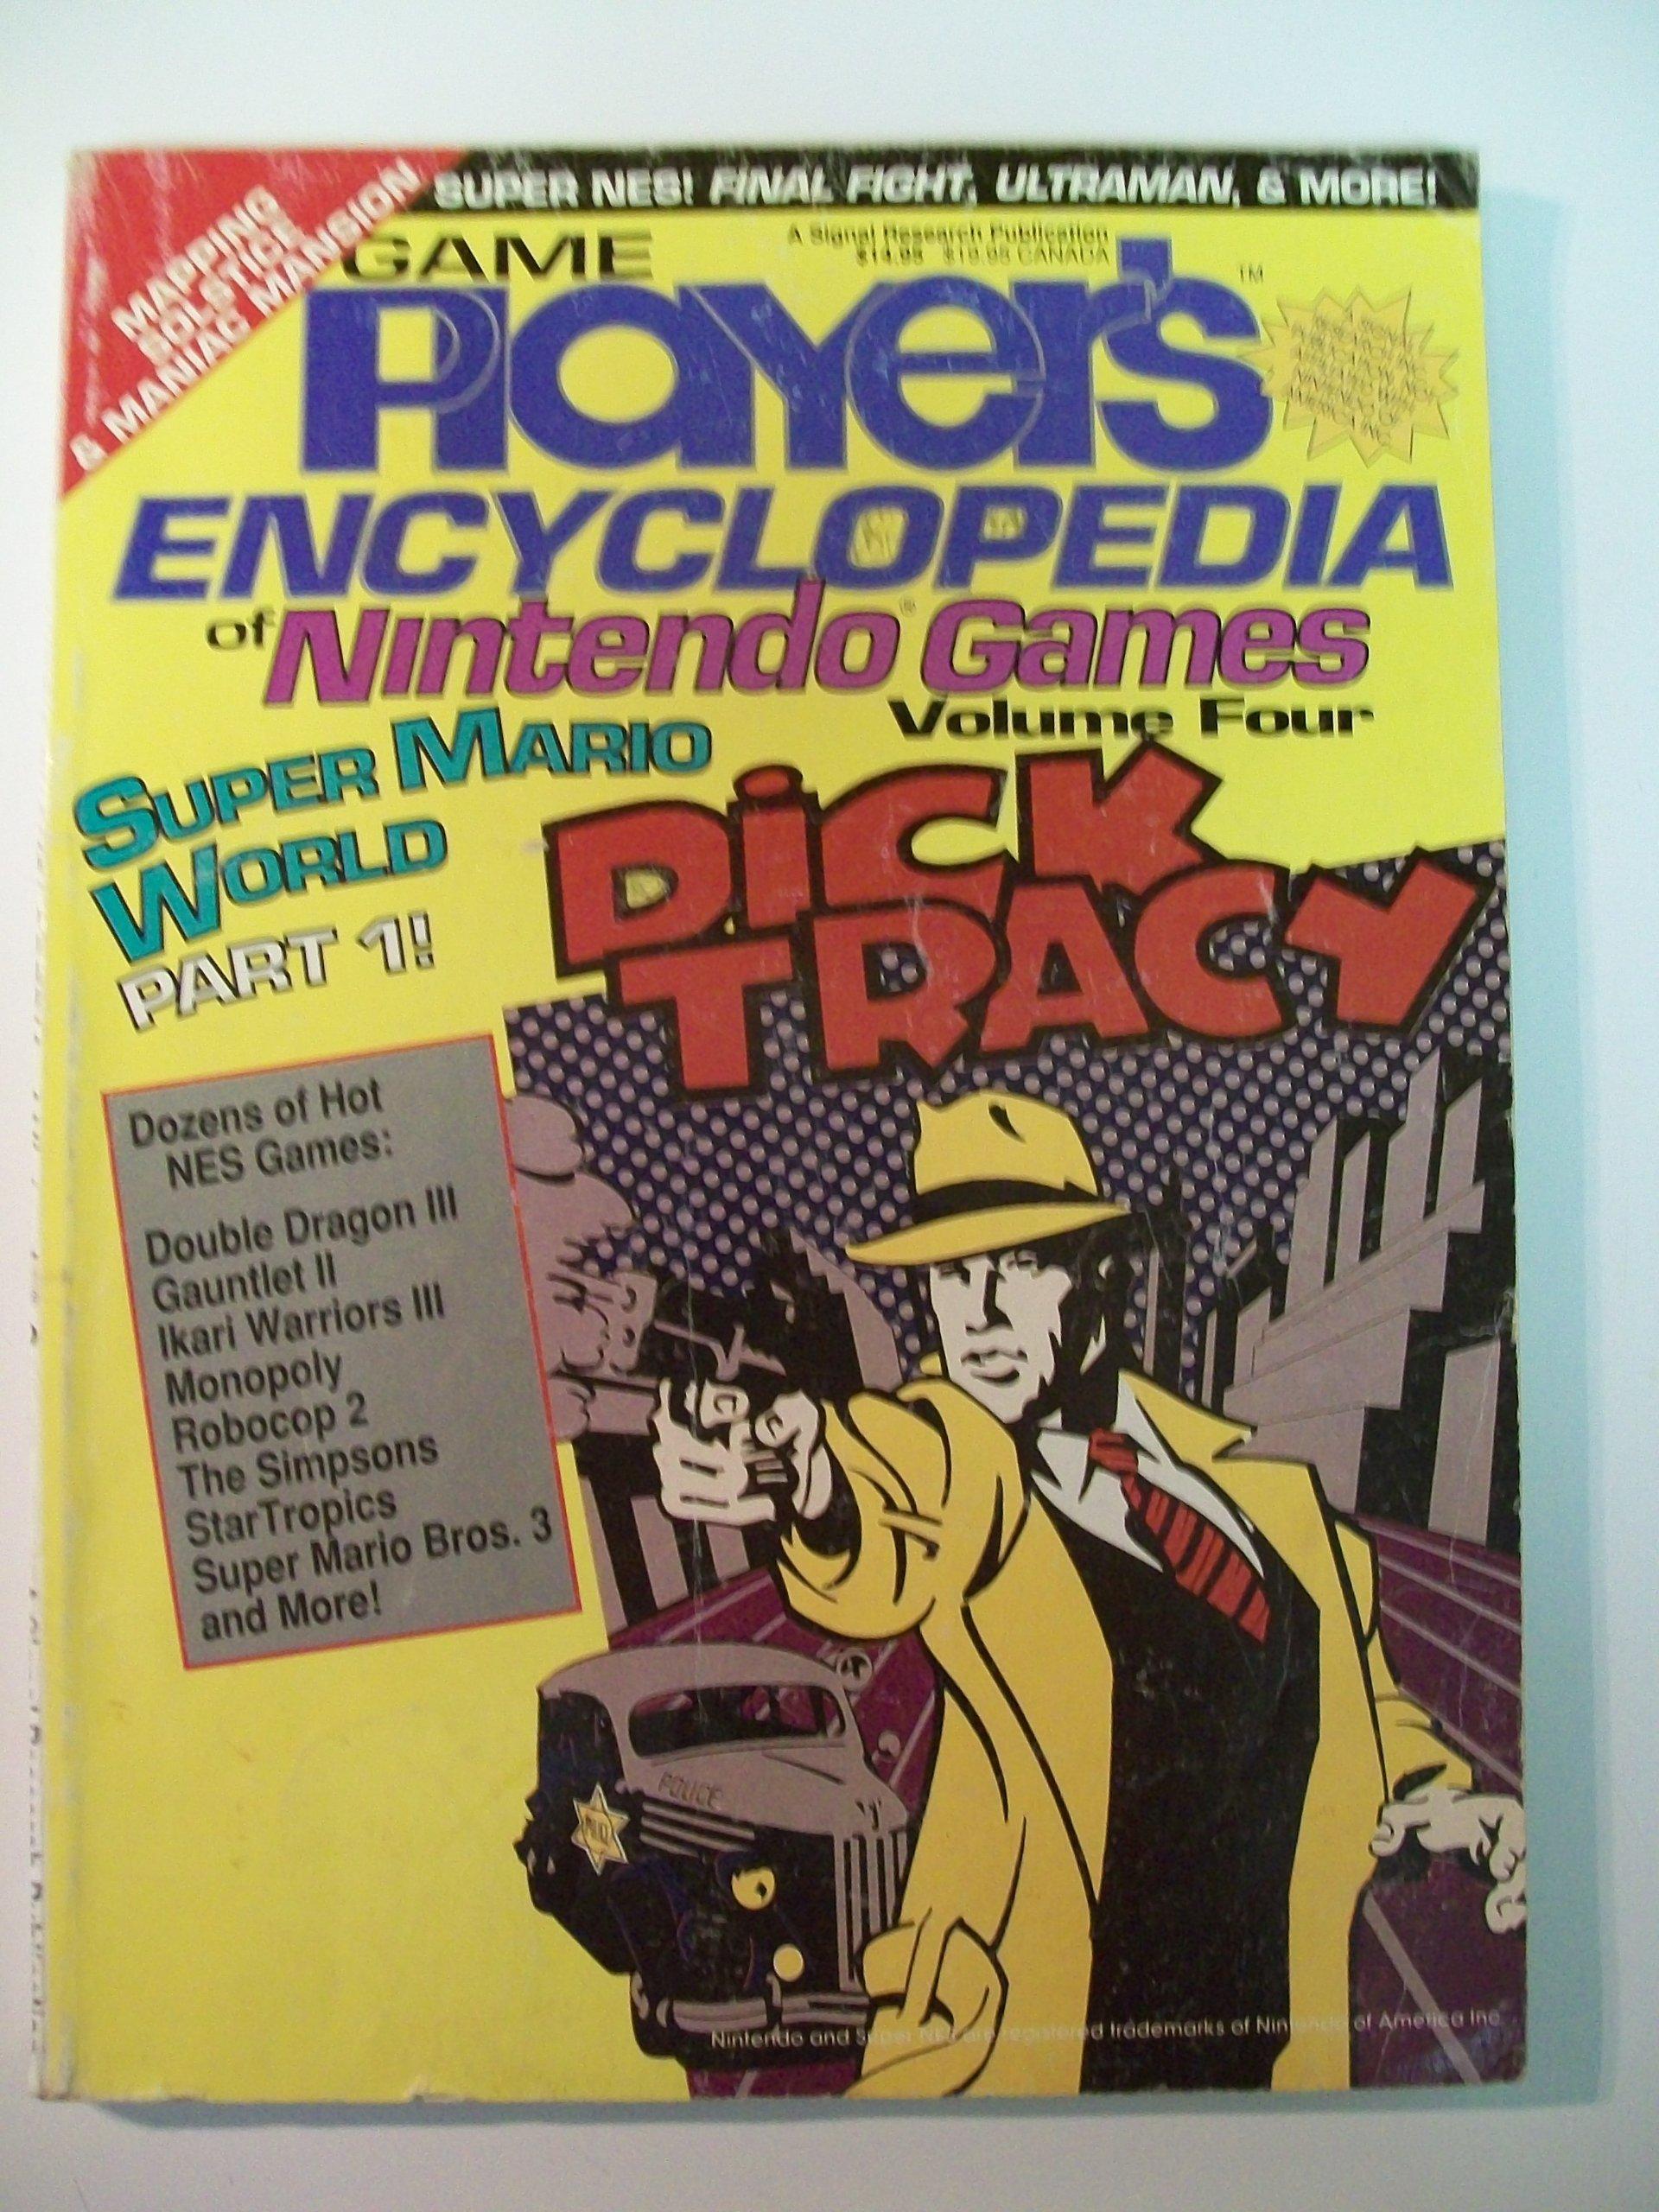 Game Players Encyclopedia of Nintendo Games: Vol 4: 004: Amazon.es: Game Players Inc.: Libros en idiomas extranjeros